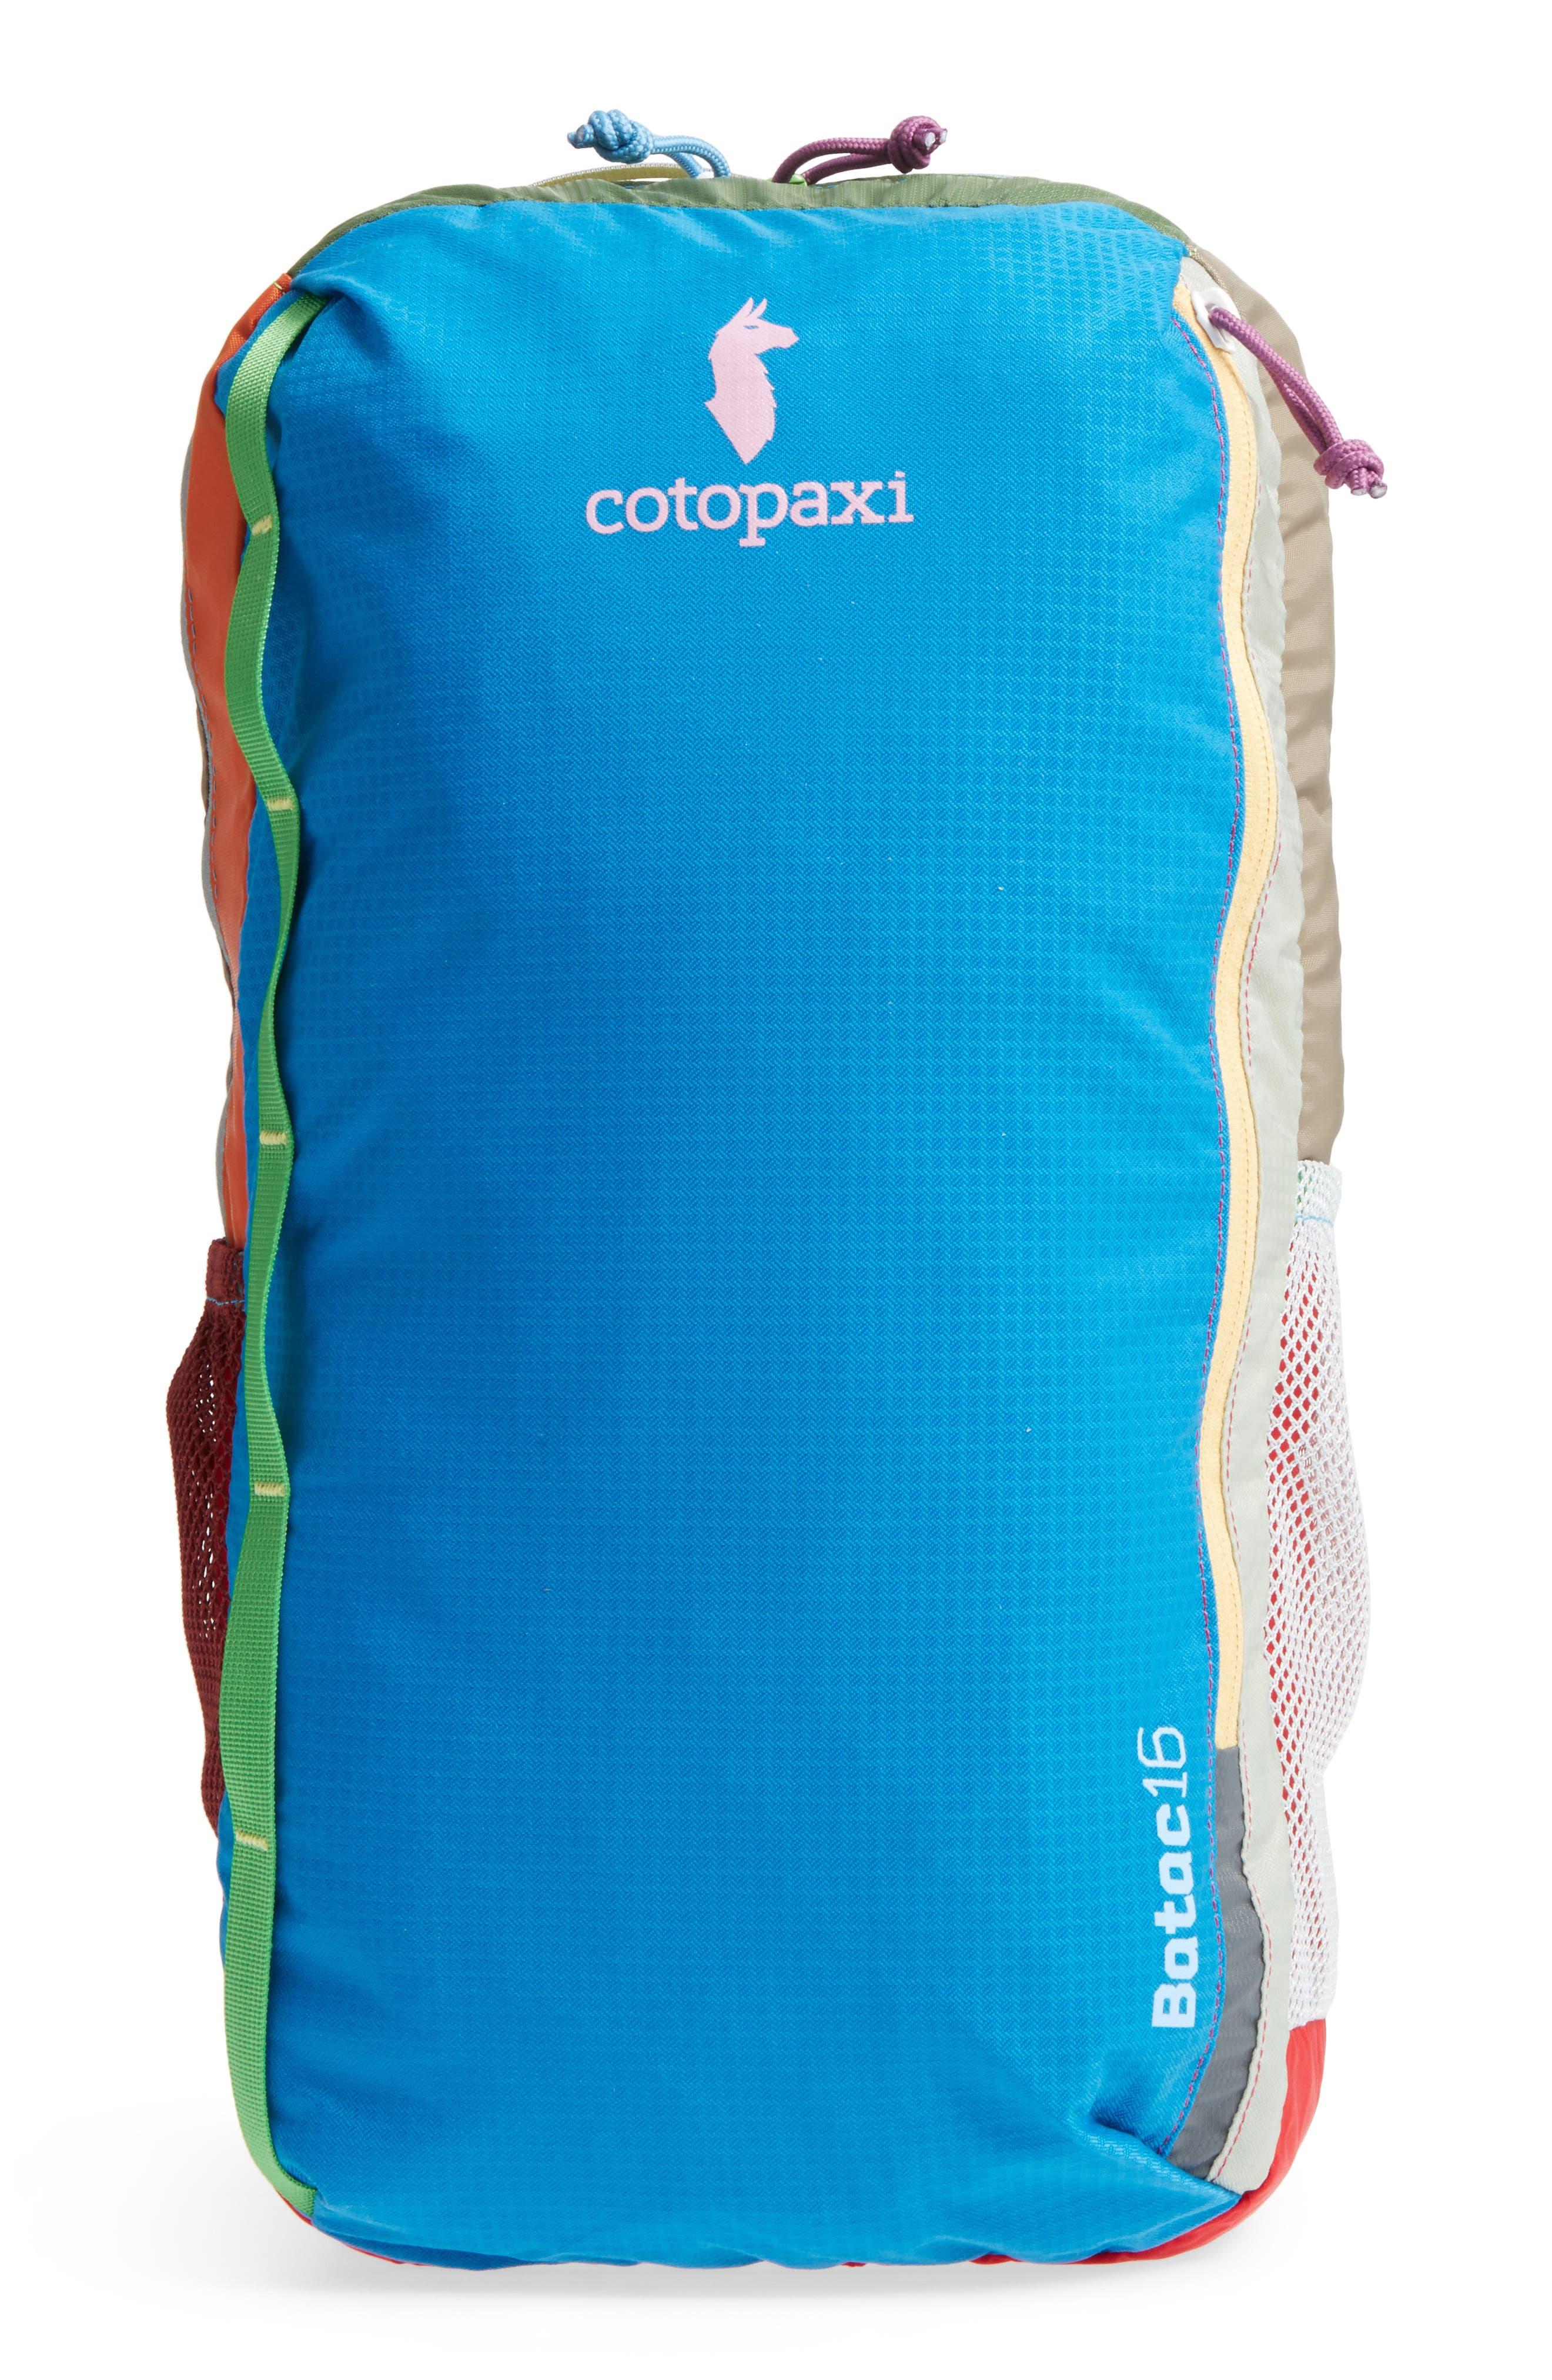 Cotopaxi Batac Del Dia One Of A Kind Ripstop Nylon Daypack - None